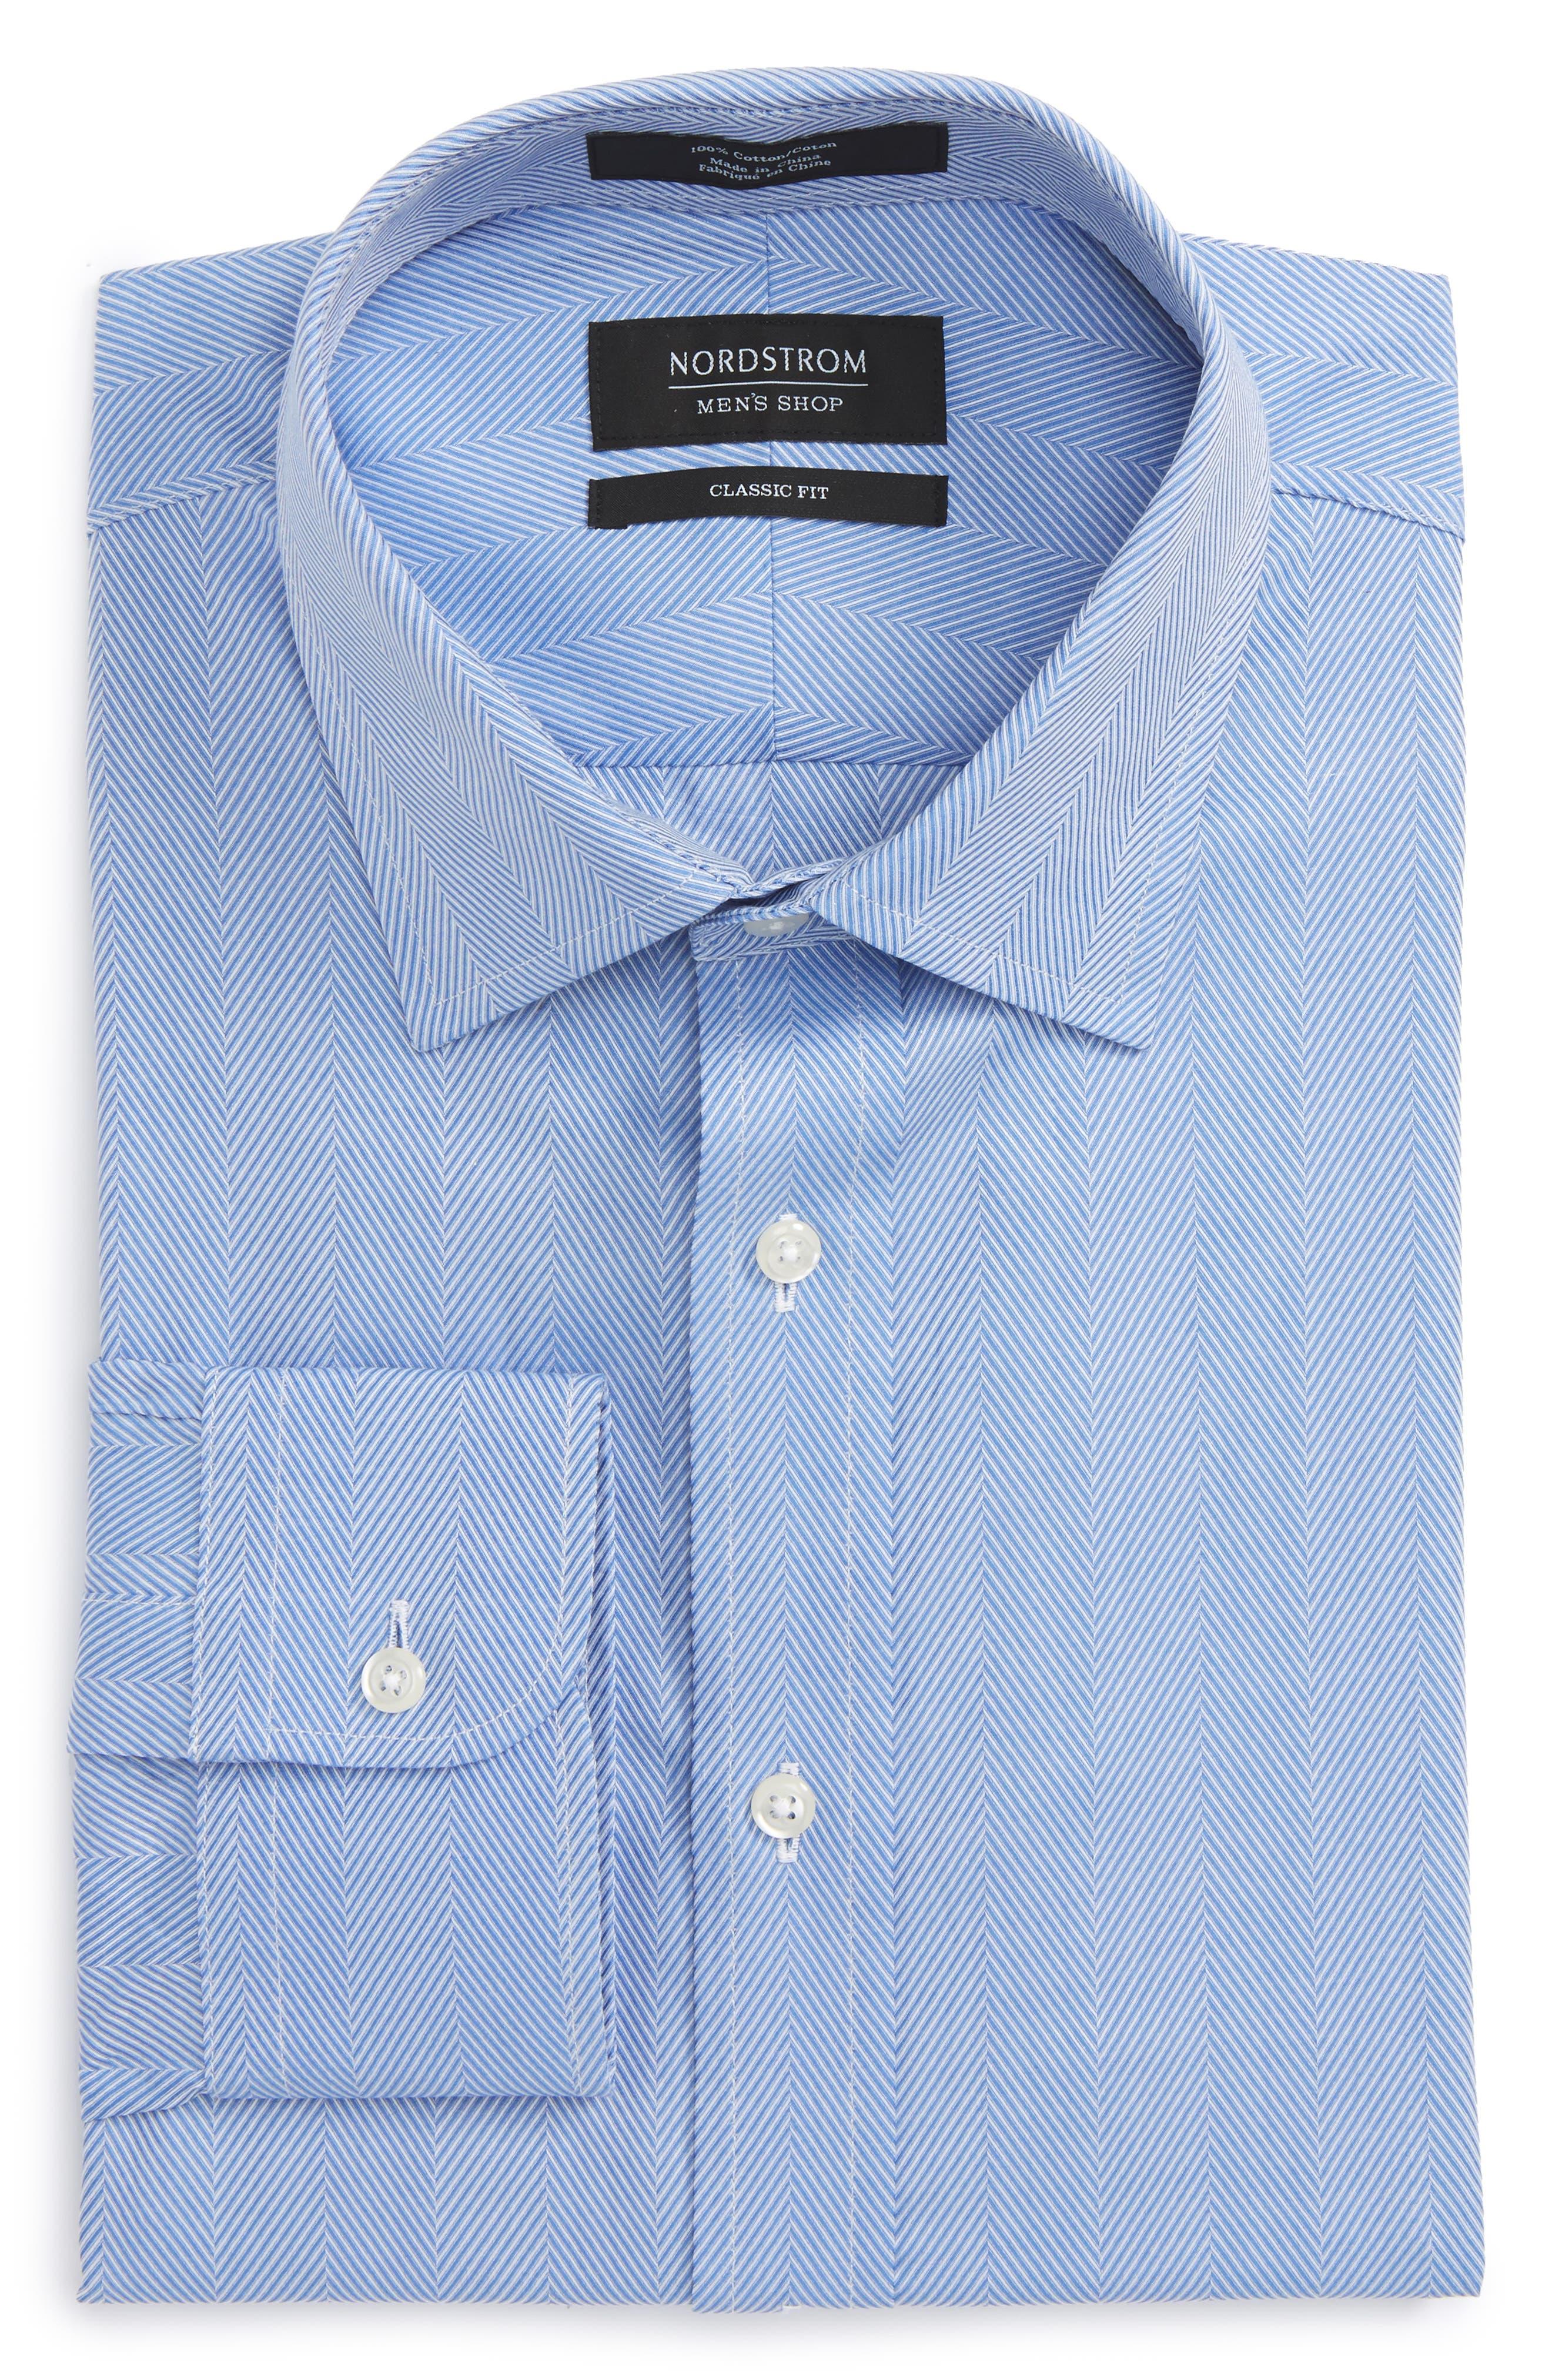 Nordstrom Men's Shop Classic Fit Herringbone Dress Shirt